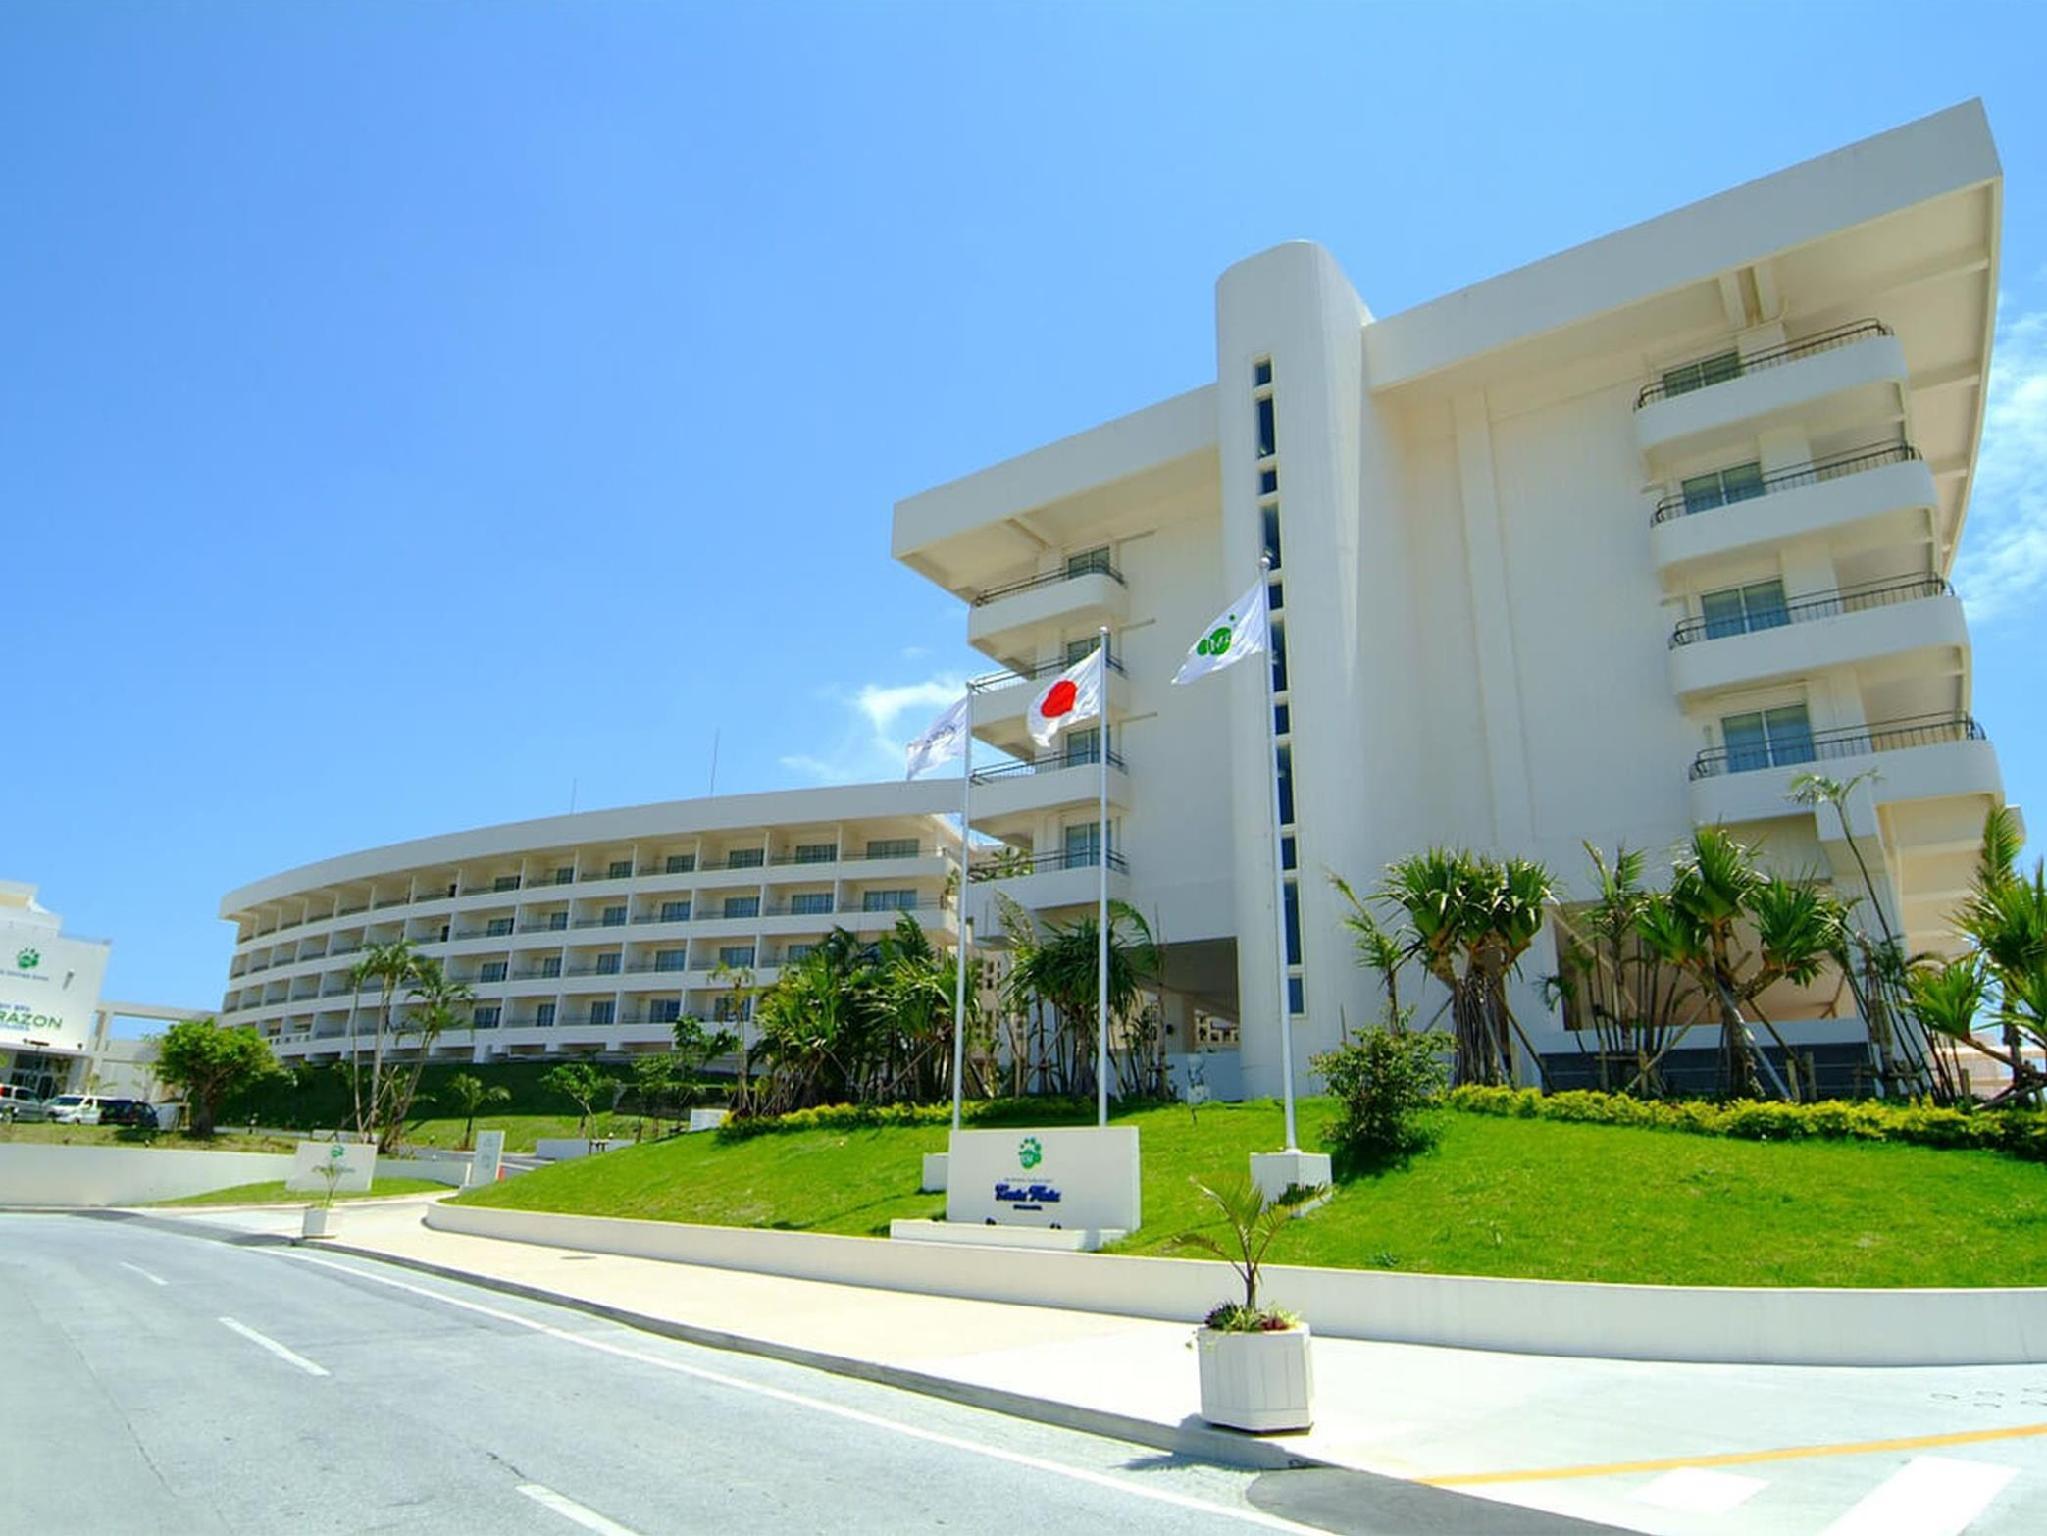 沖繩EM科斯塔健康度假Spa酒店 EM Wellness Resort Costa Vista Okinawa Hotel  Spa